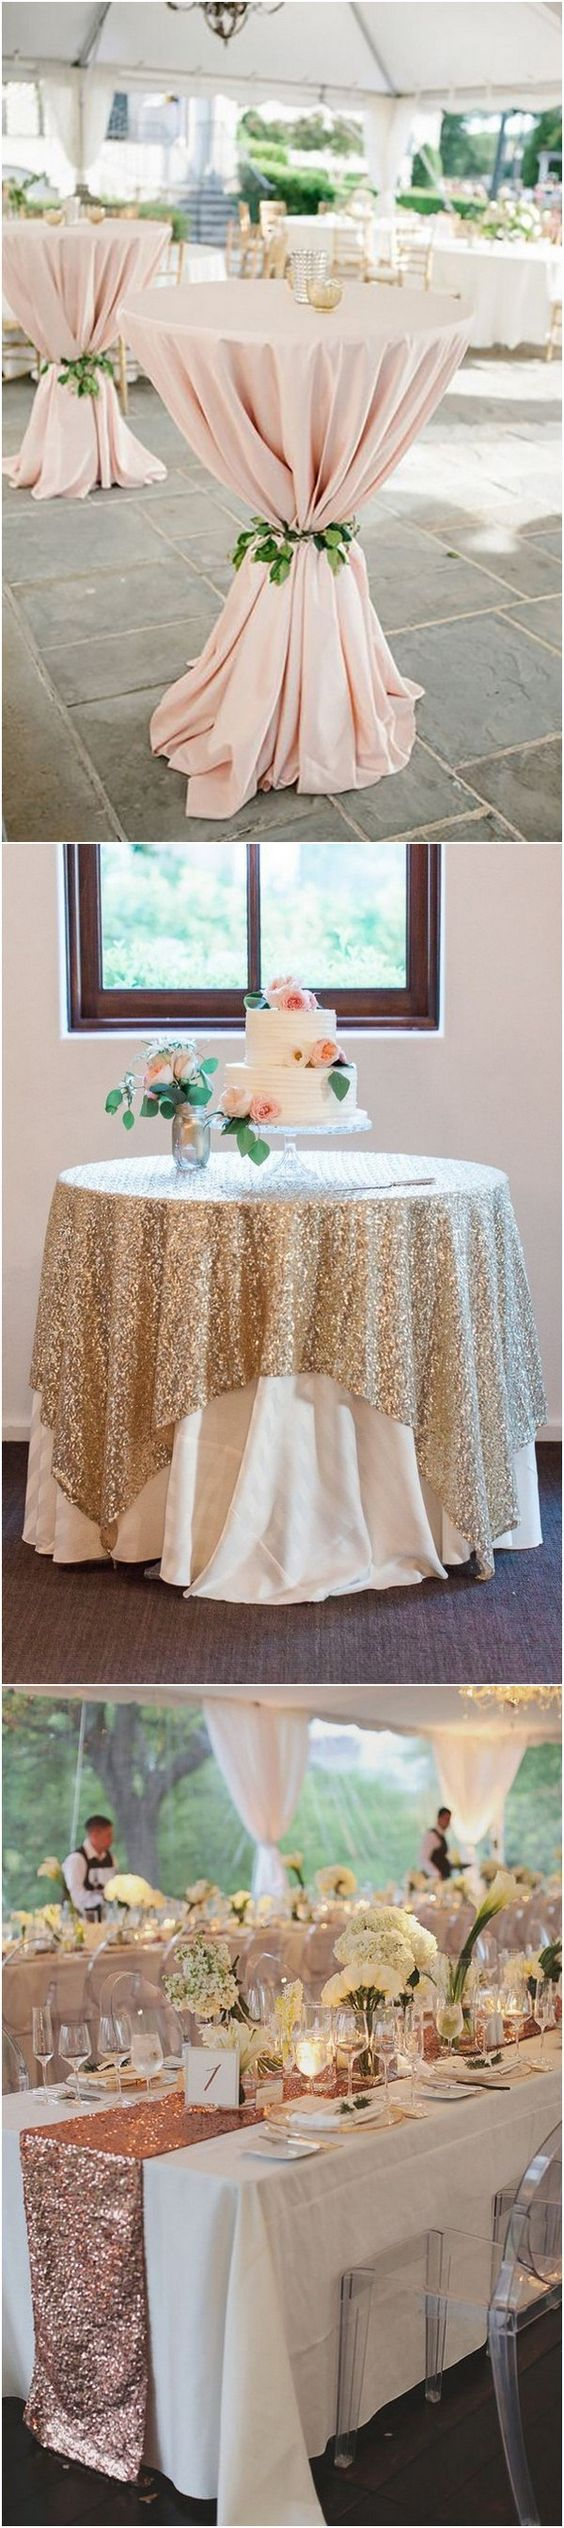 Diy wedding table decorations ideas   Brilliant Wedding Table Decoration Ideas  Wedding table decor